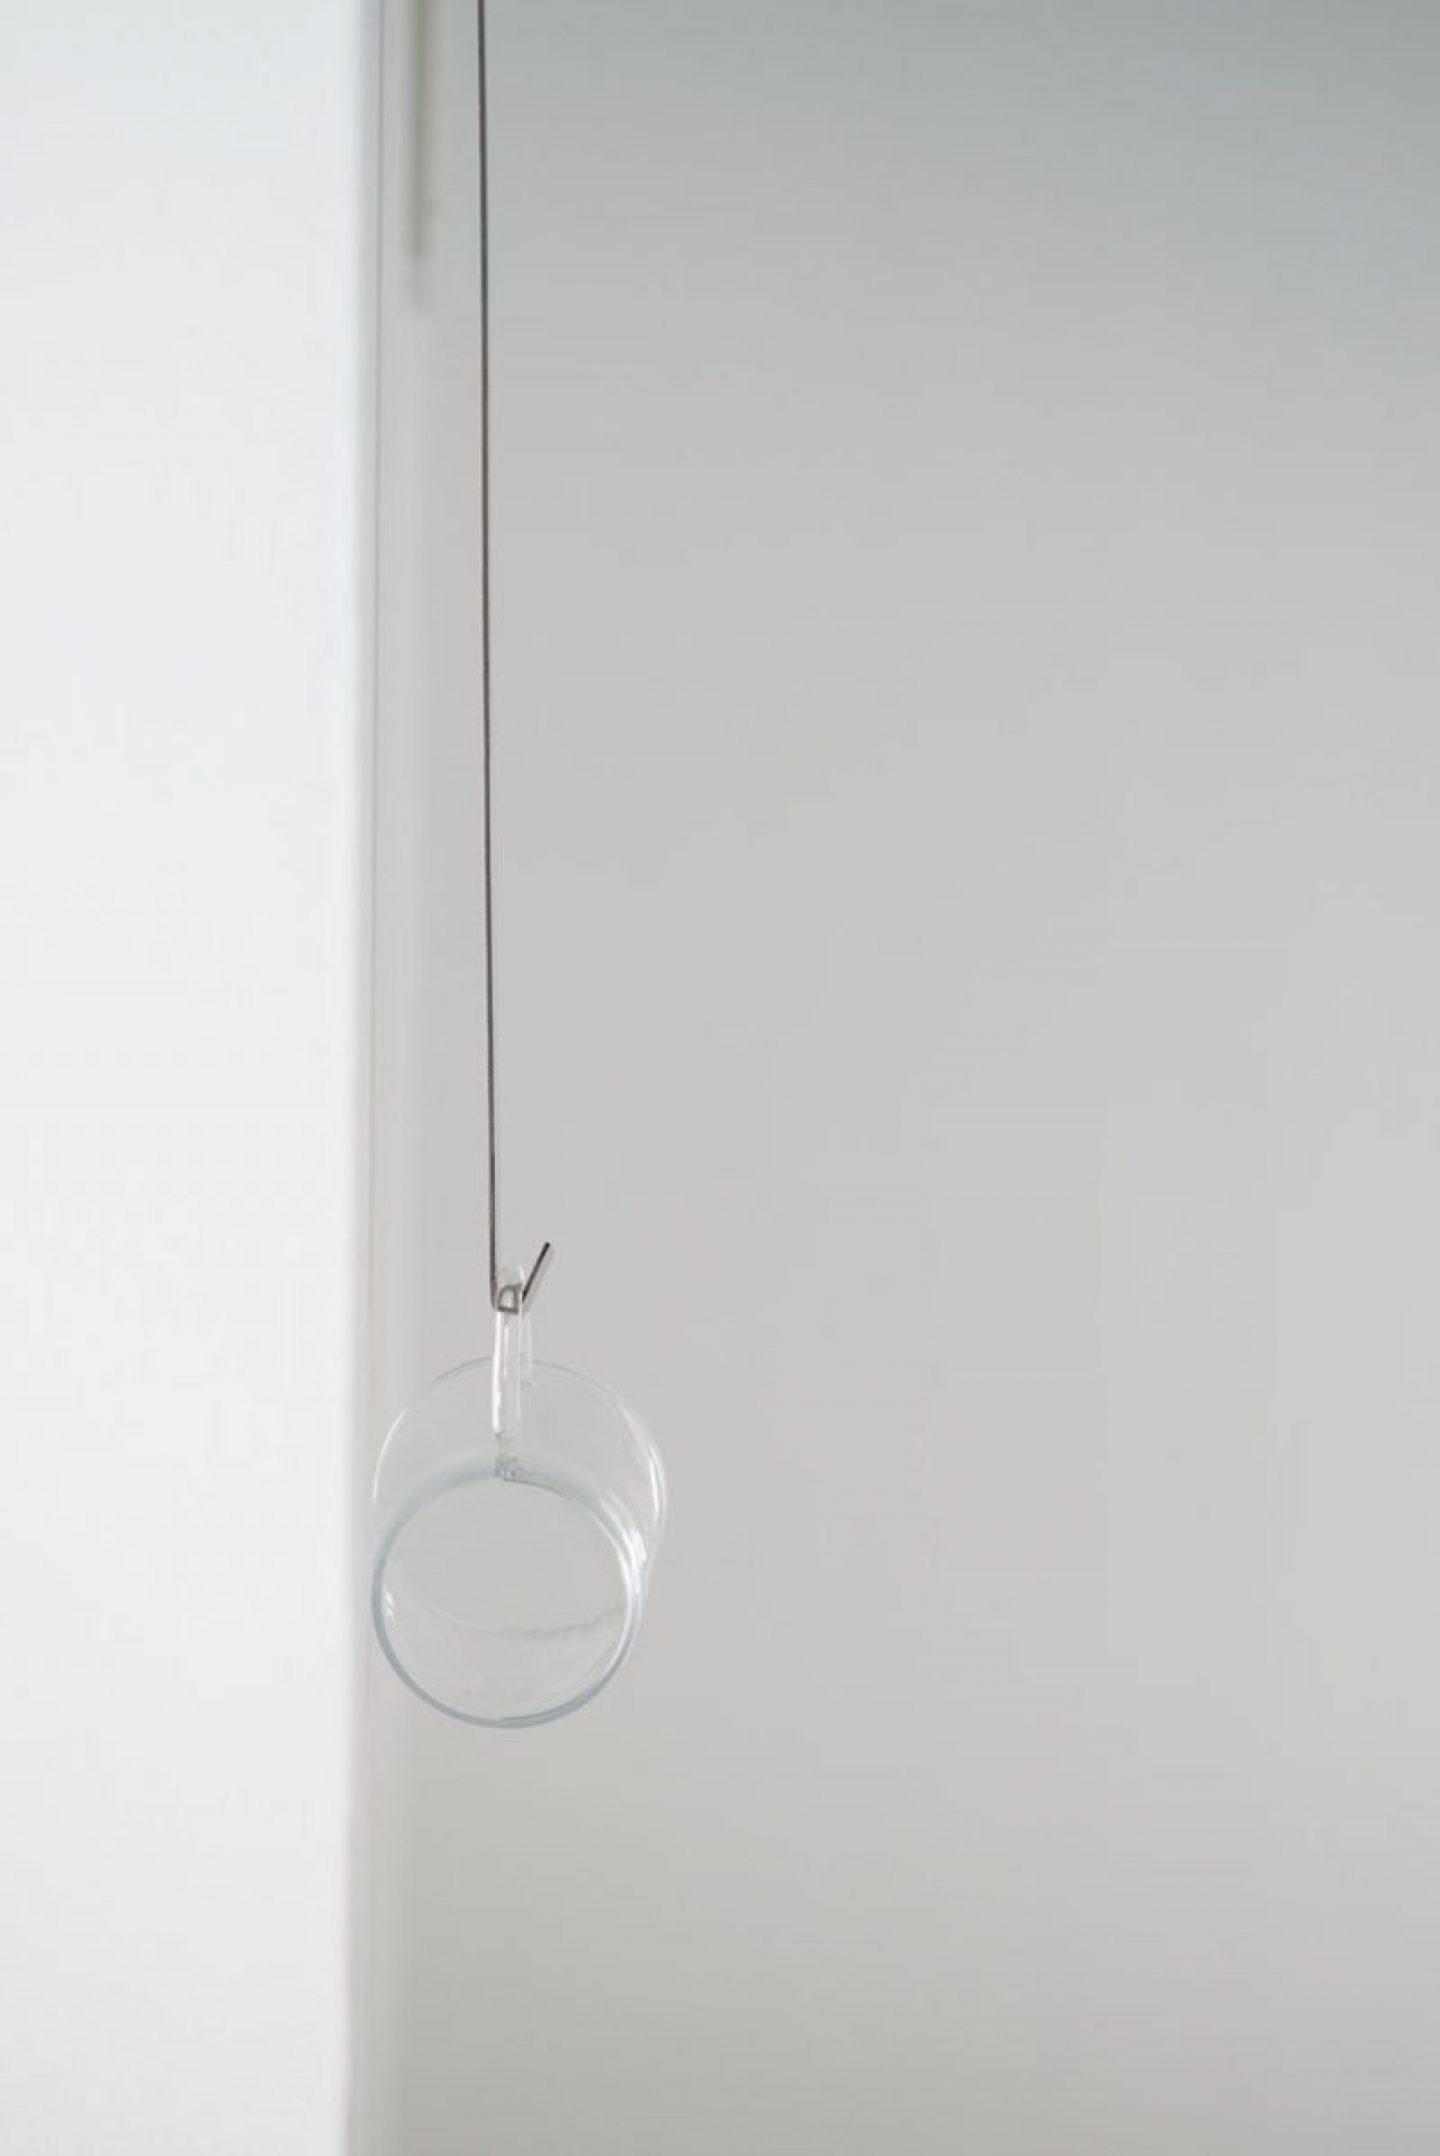 iGNANT_Design_New_Balance_Of_Life_Kosaku_Matsumoto_09